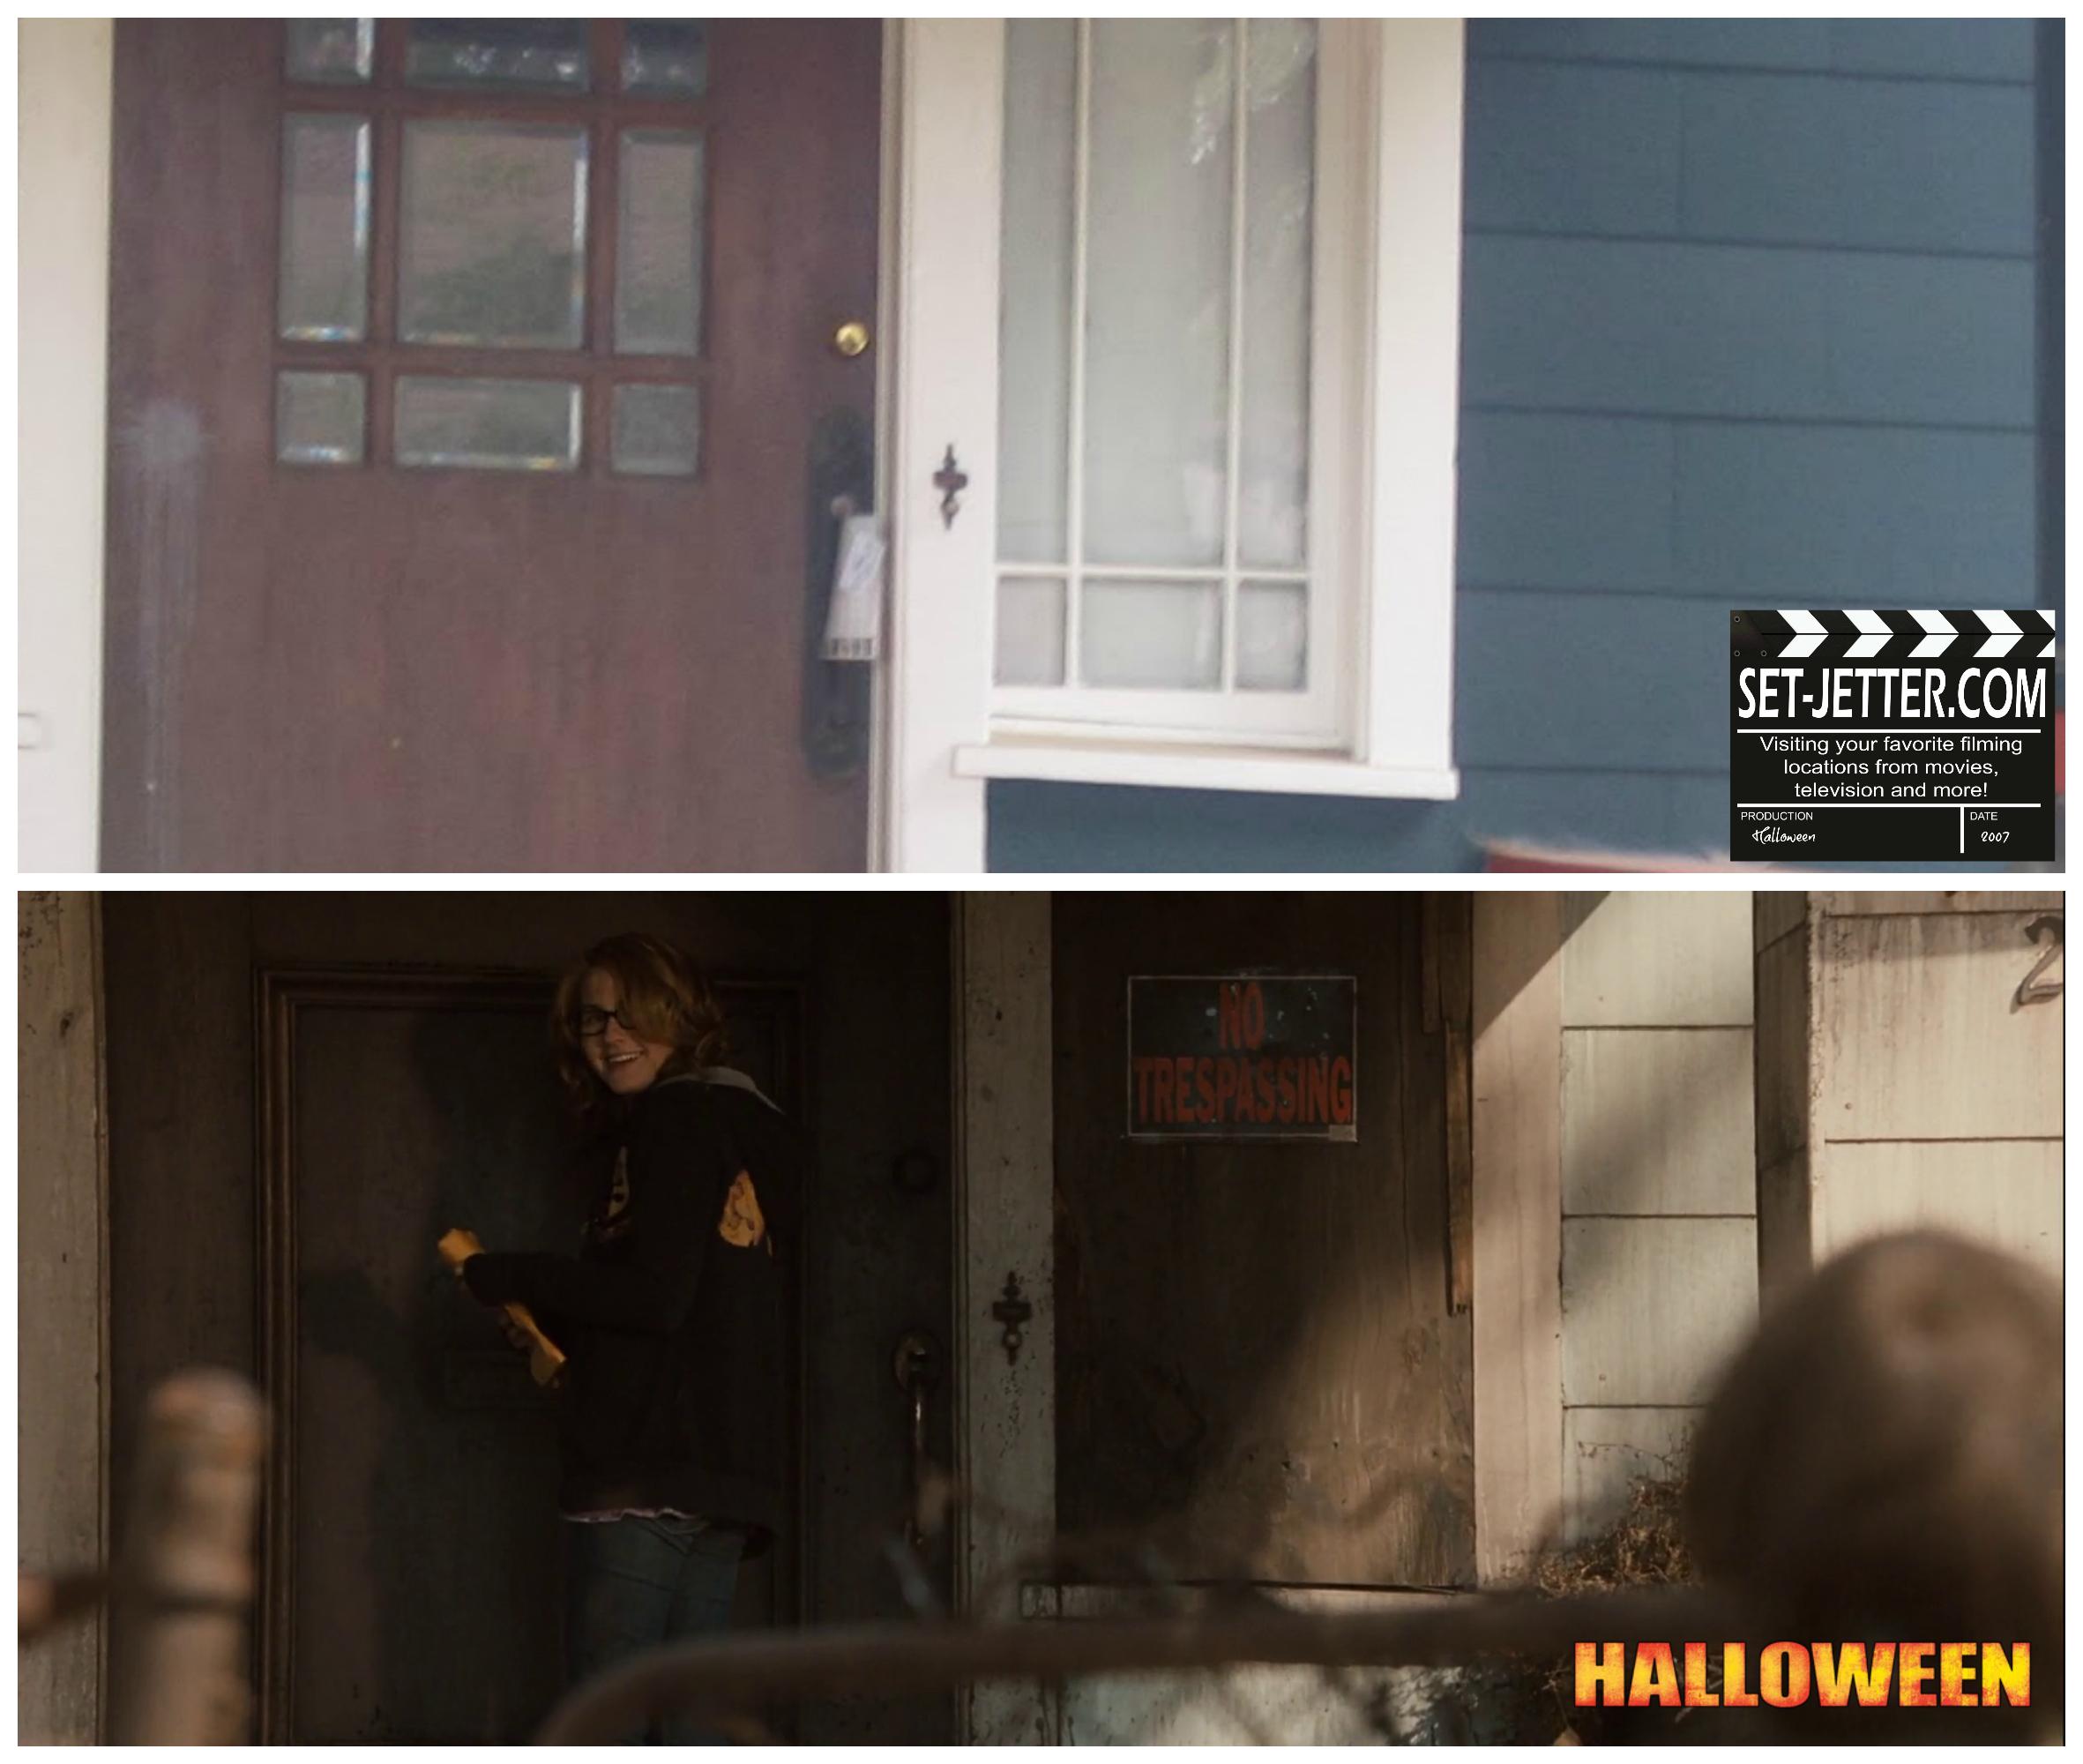 Halloween 2007 comparison 13.jpg